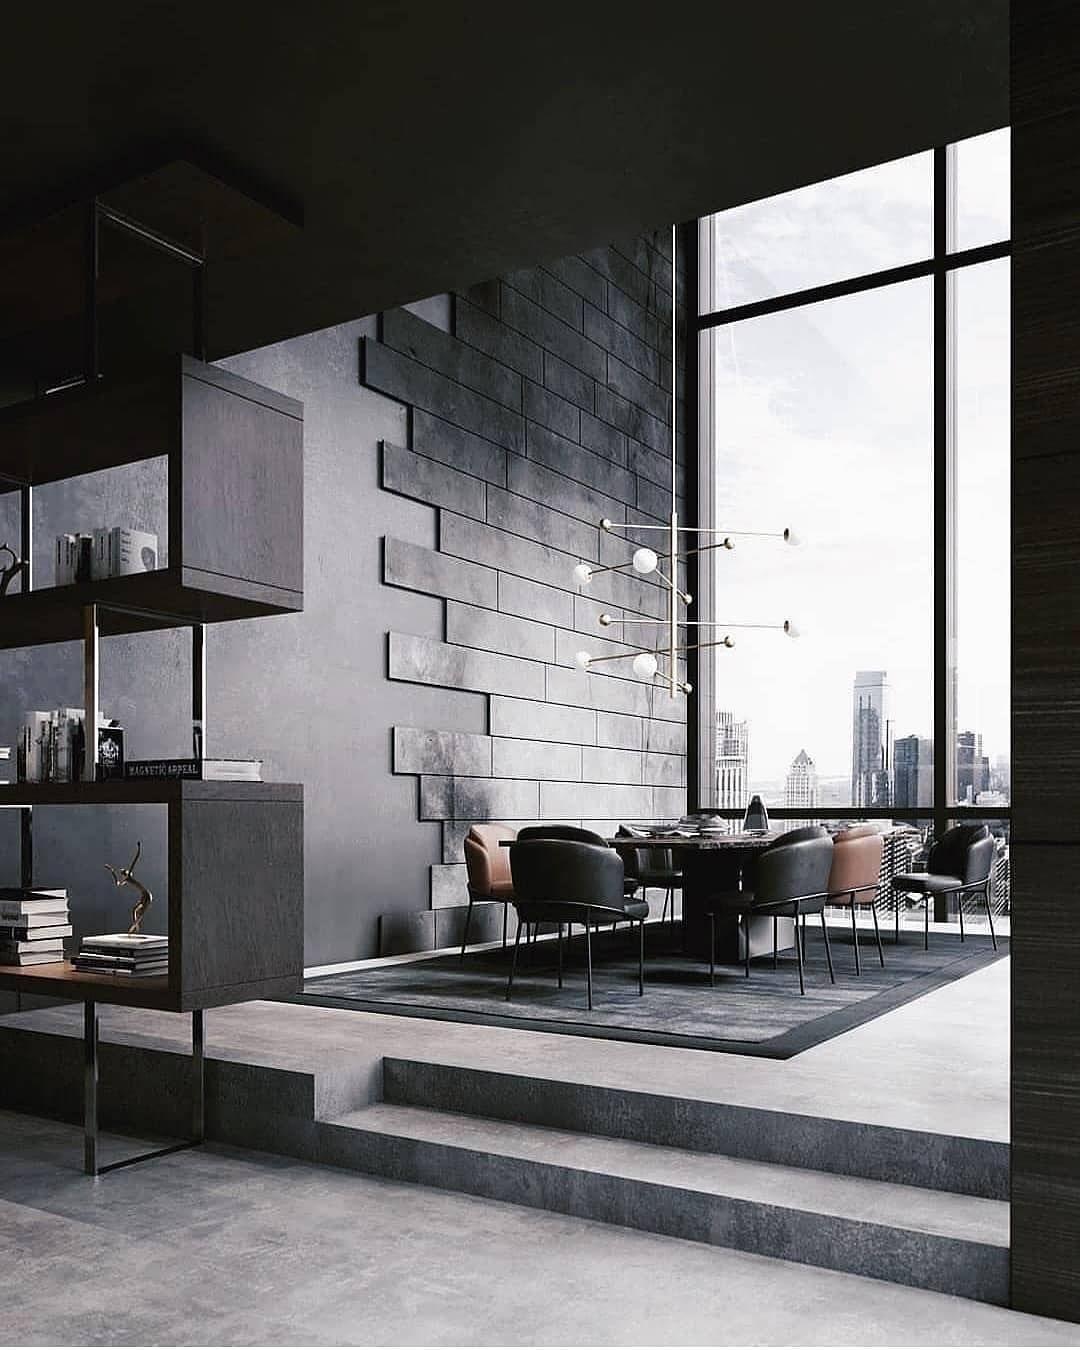 Stunning 24 Beegcom Best Furniture Advertising Ideas Home Decor Catalogs Top Interior Design Firms Cheap Home Decor Stores